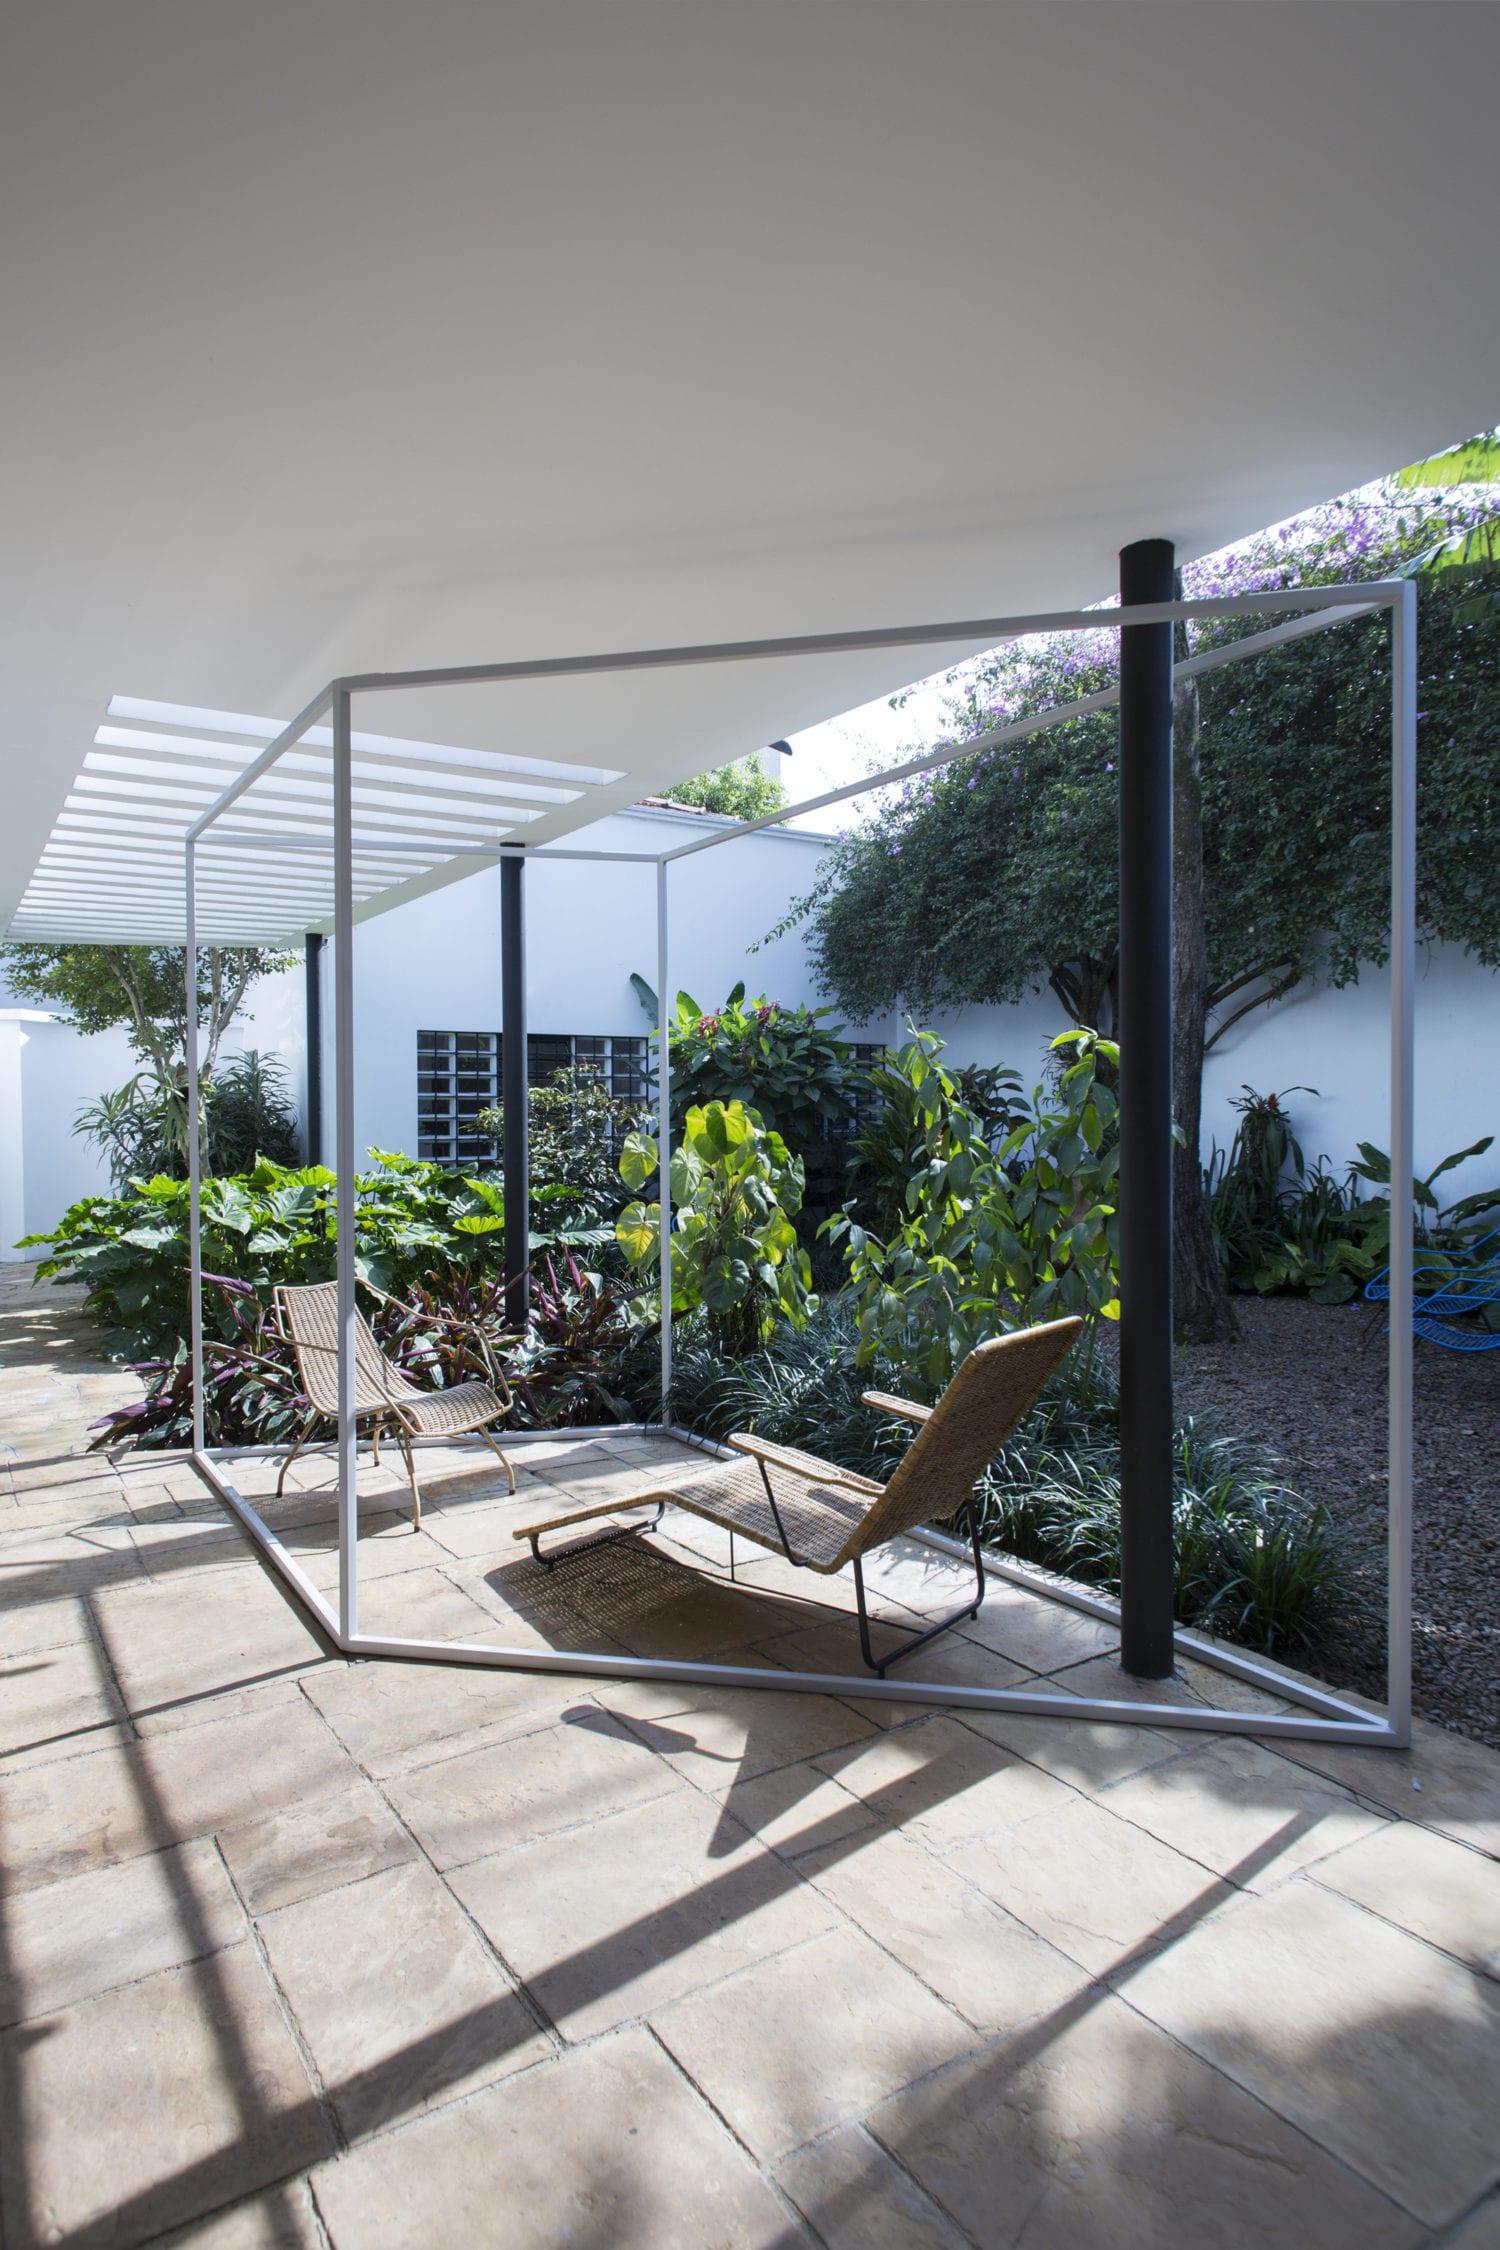 Apartment 61 Home Gallery In Sao Paulo Brazil By Mnma Studio Yellowtrace 09